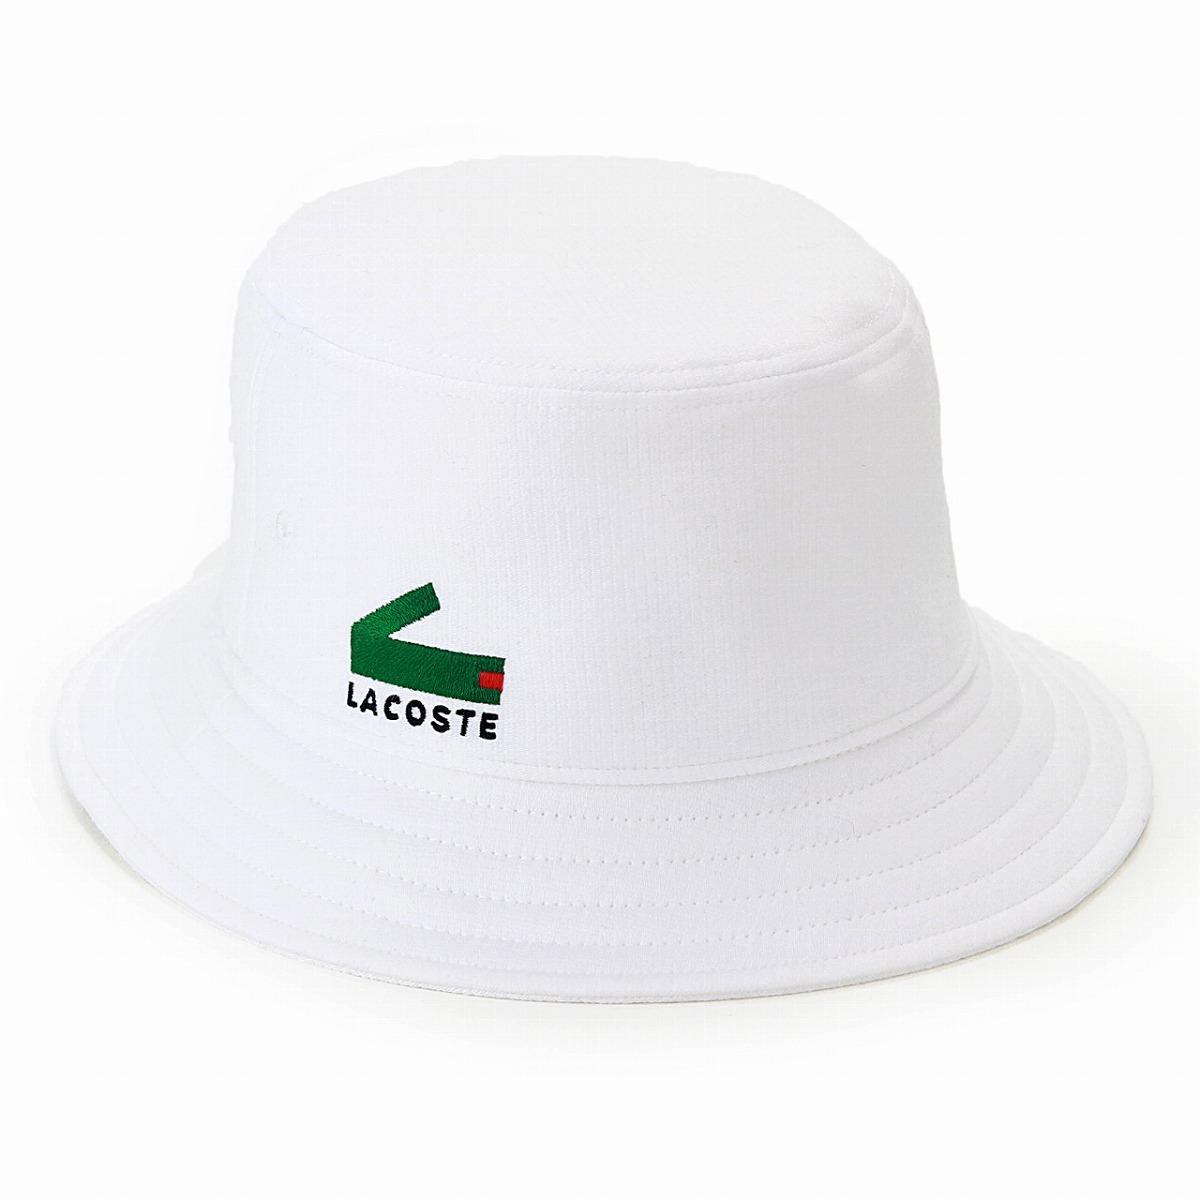 ELEHELM HAT STORE  Sakha re-hat men Lacoste hat lacoste safari hat ... f0aa052798c9